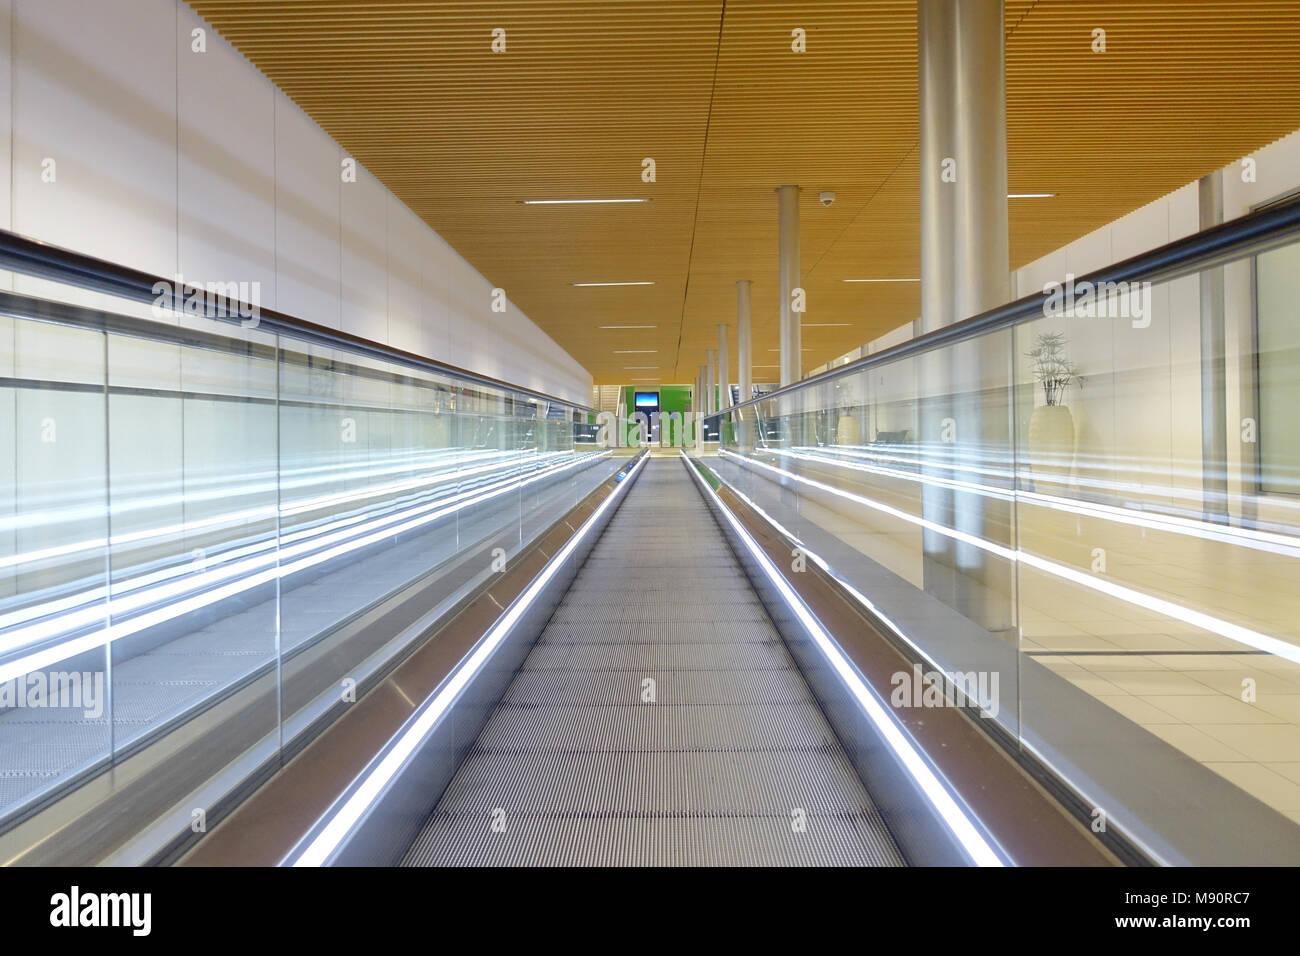 Roissy Charles de Gaulle airport.  Escalator. France. - Stock Image